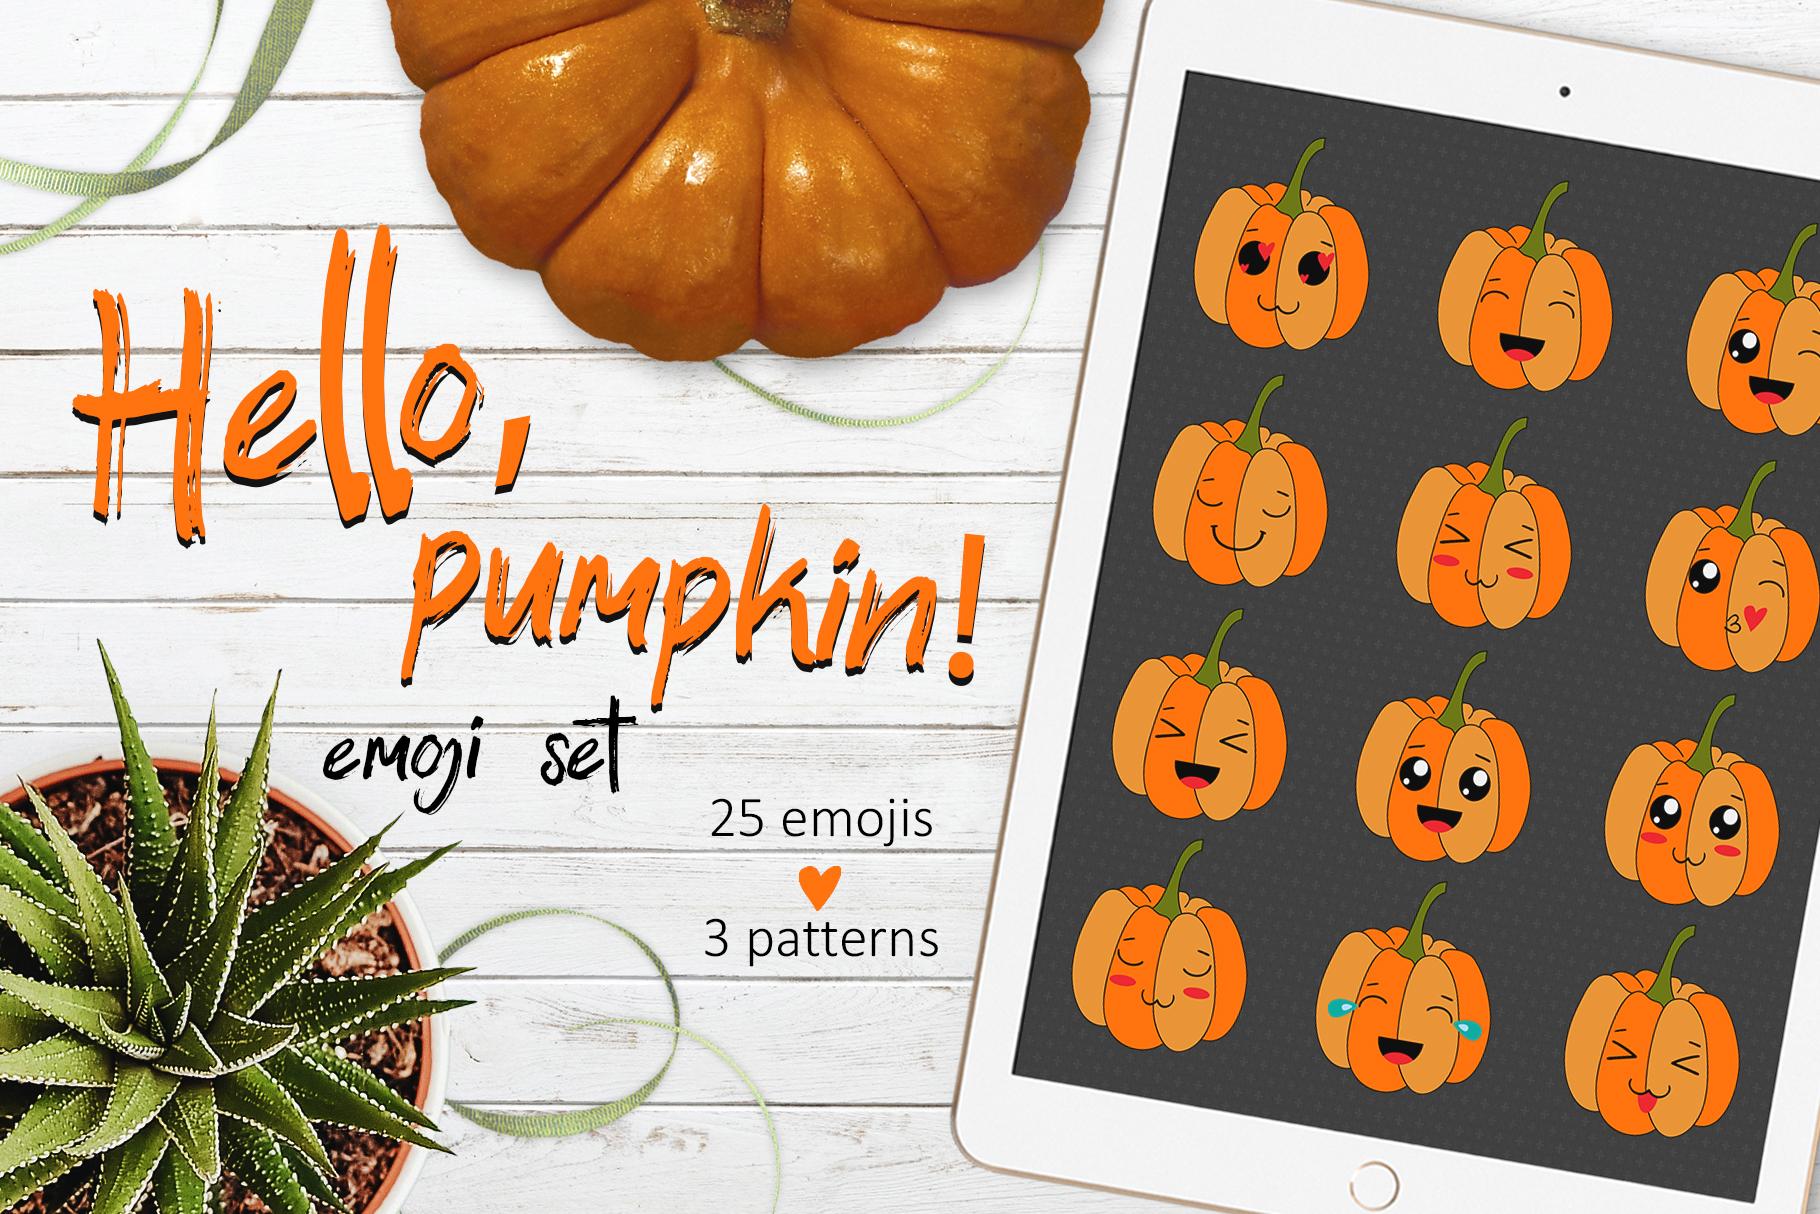 Funny Pumpkins Emoji Set And Patterns